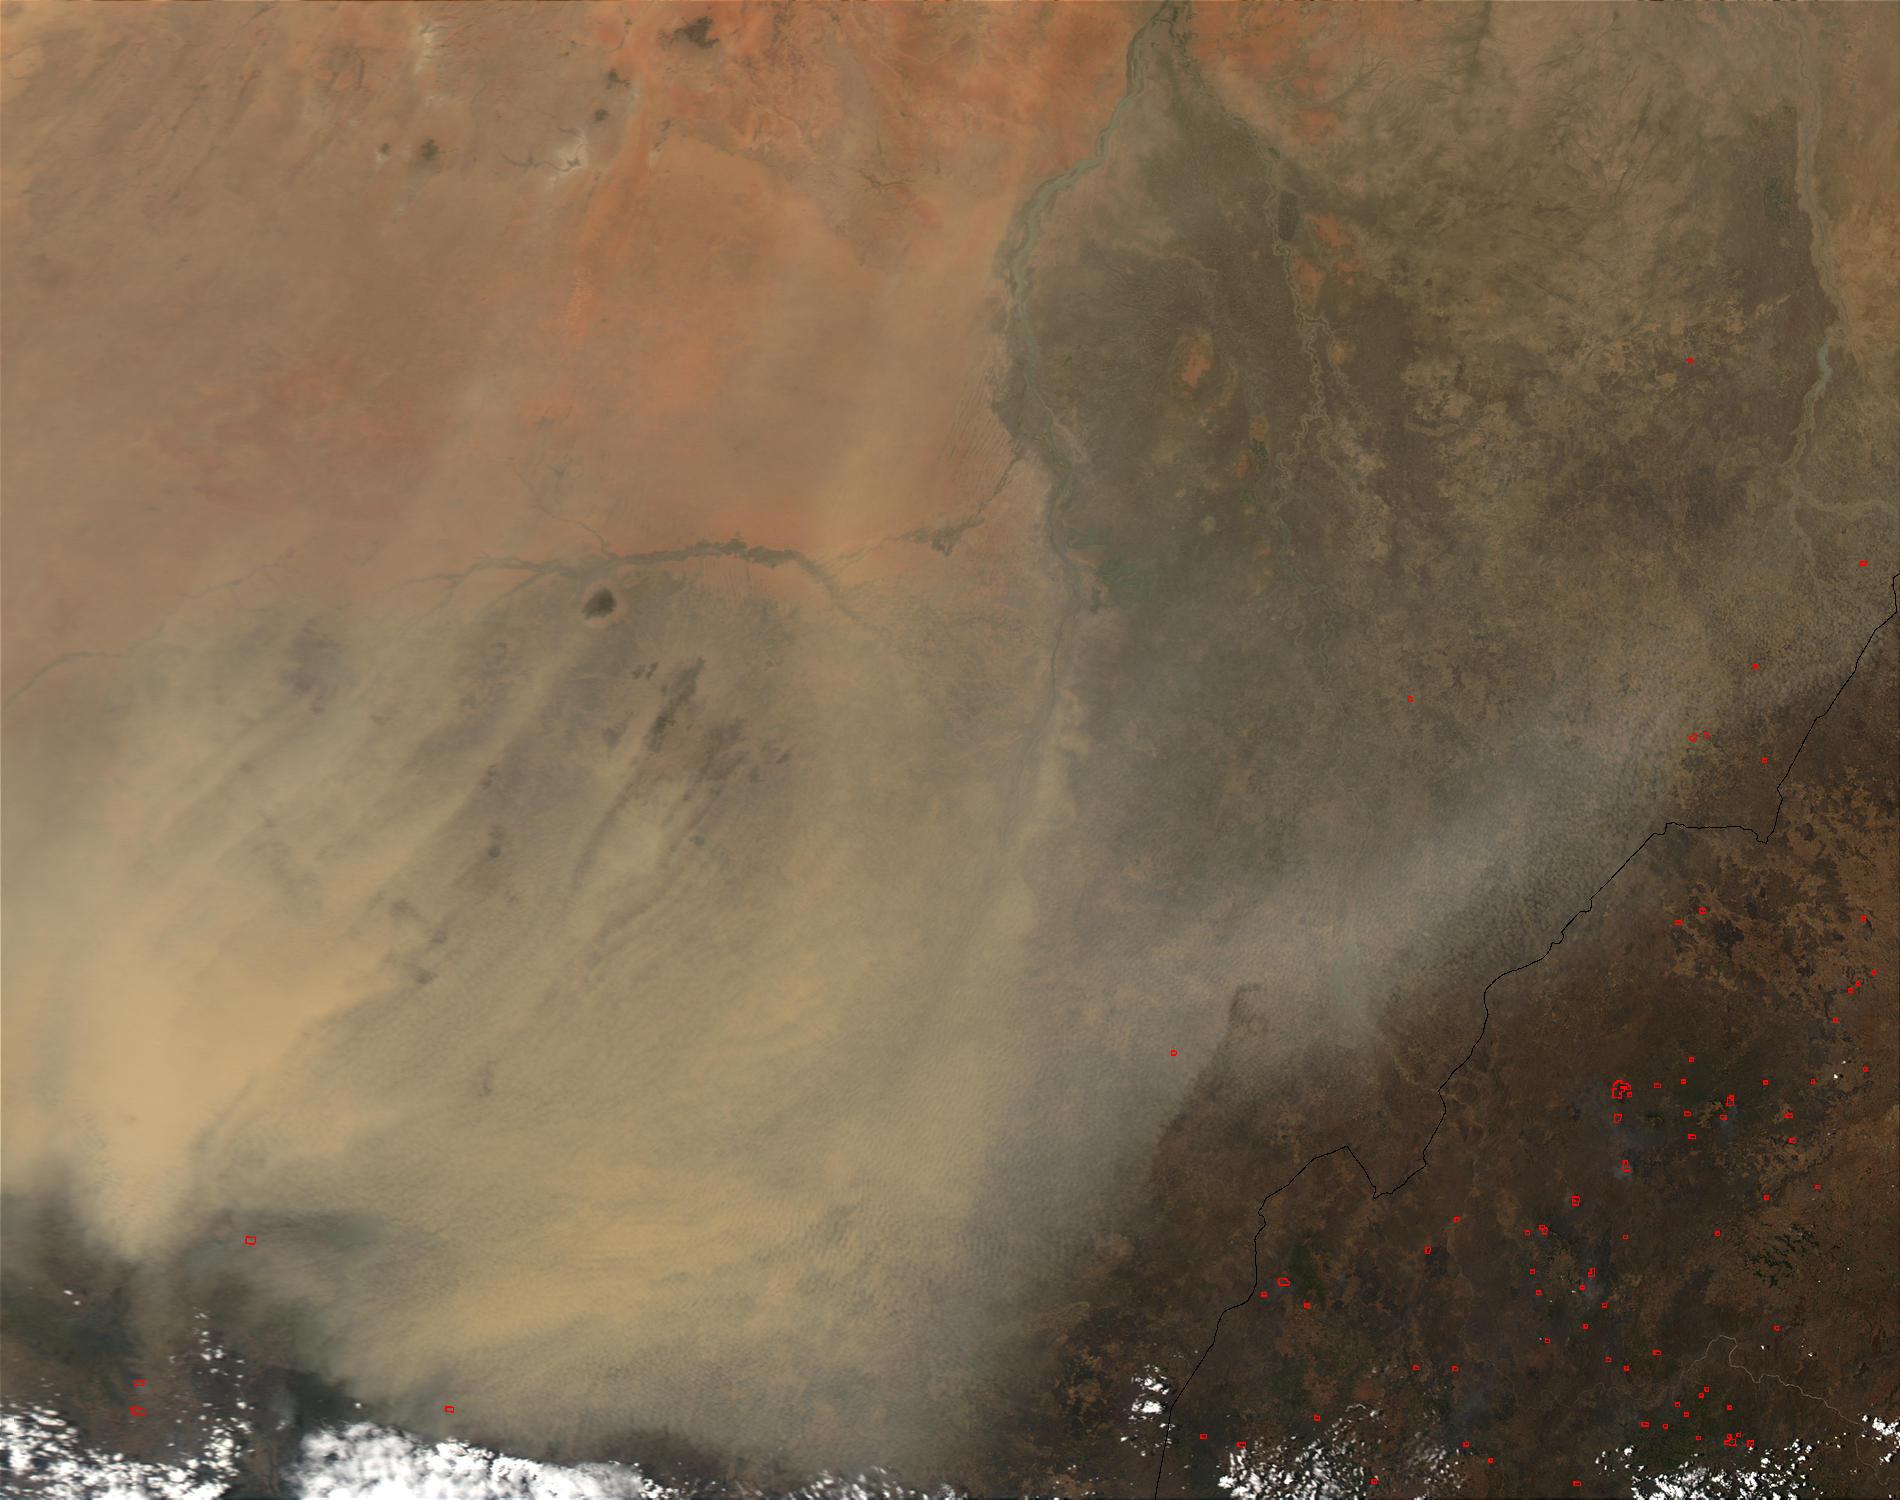 dust storms nasa - photo #9